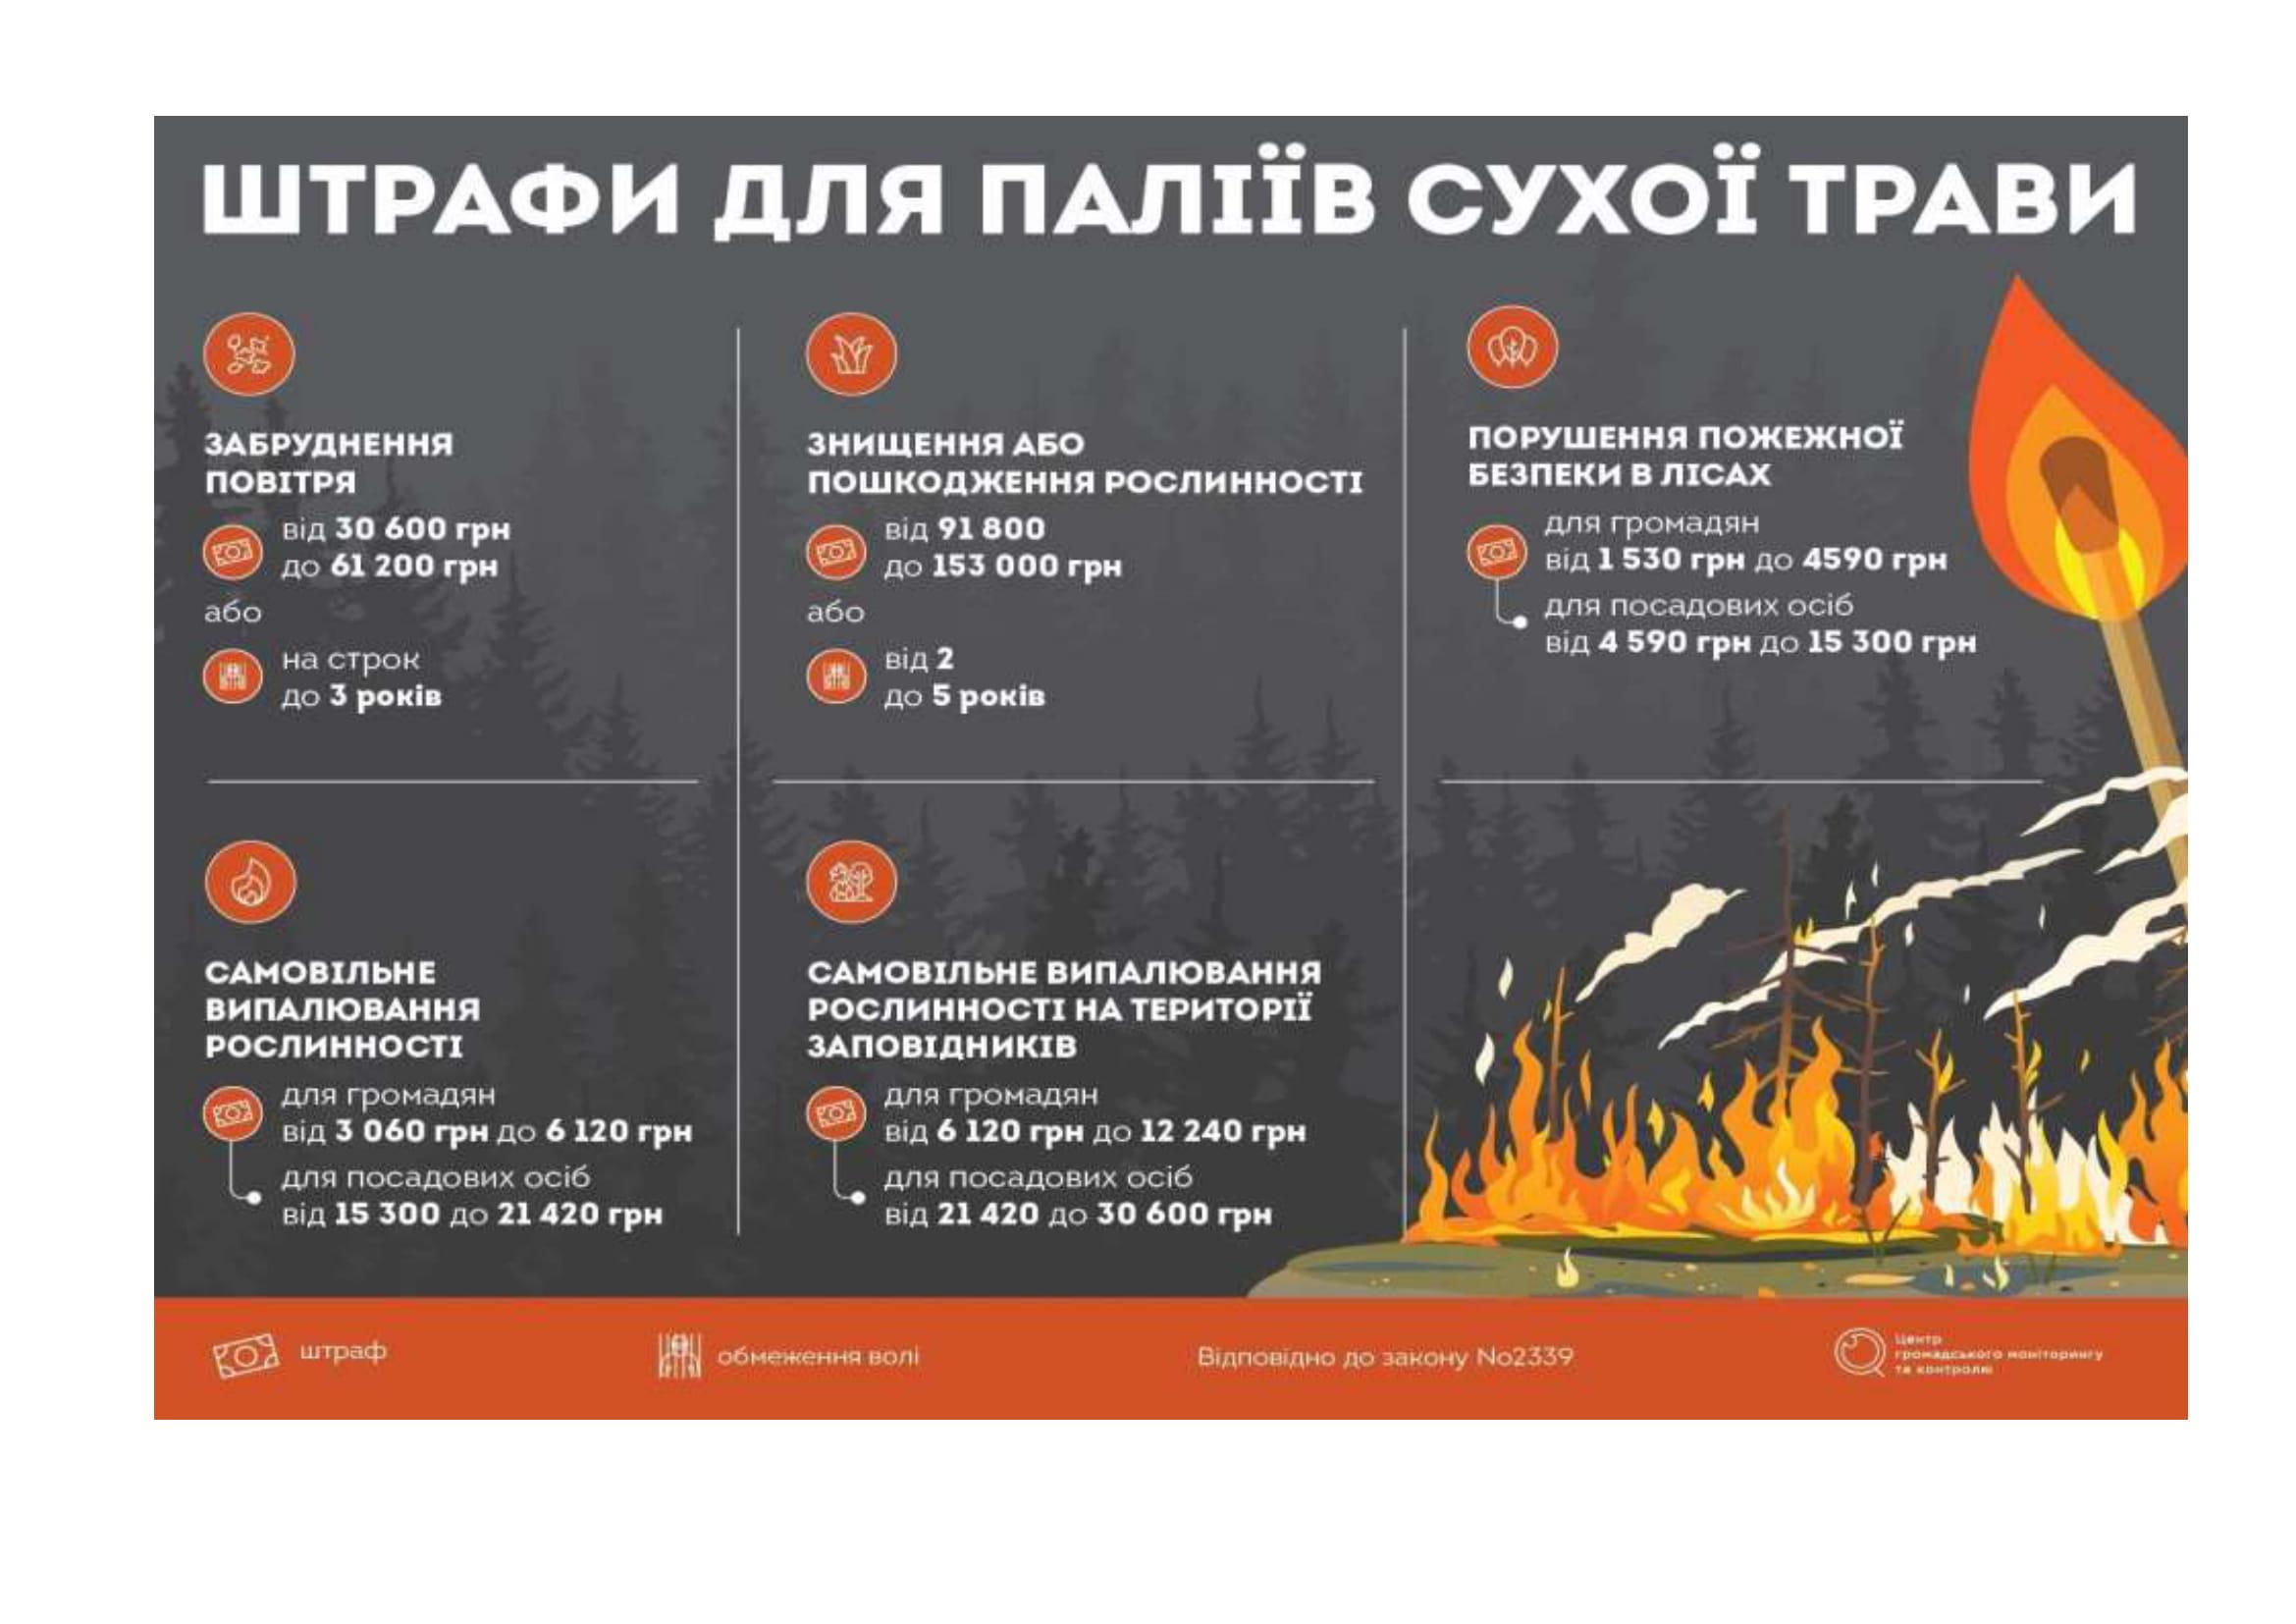 пожежна безпека 2